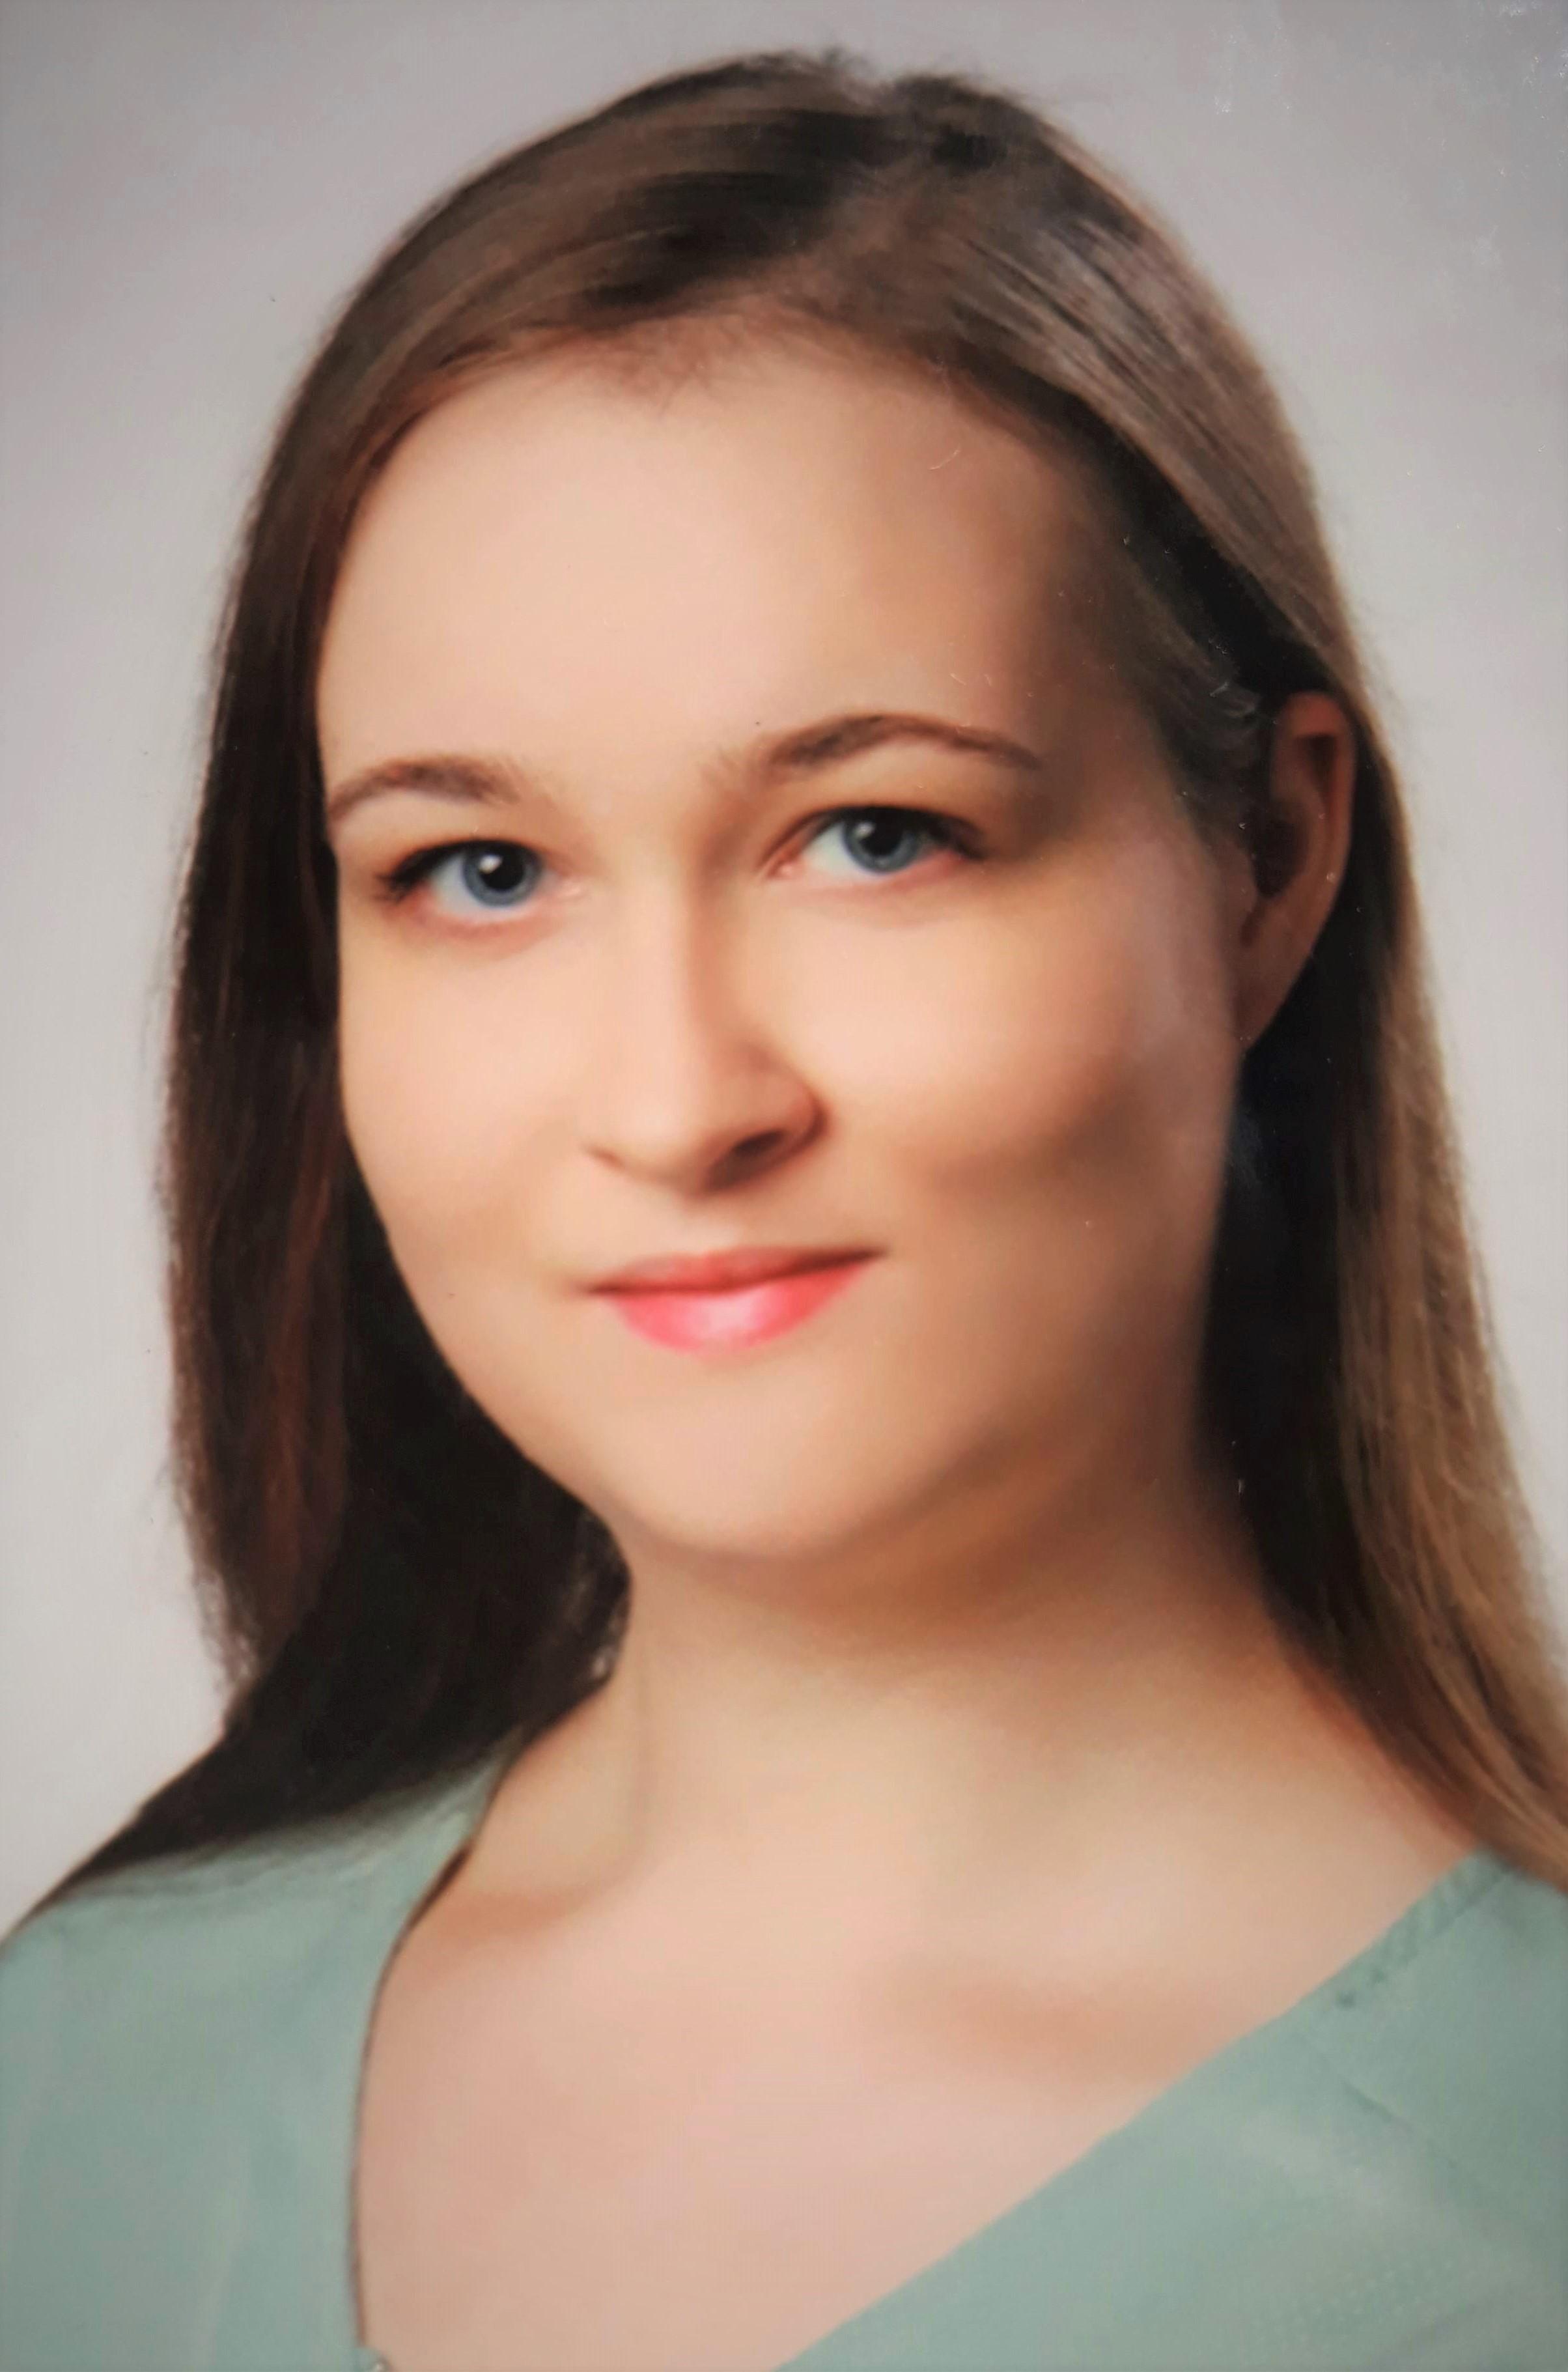 Izabella Skulimowska